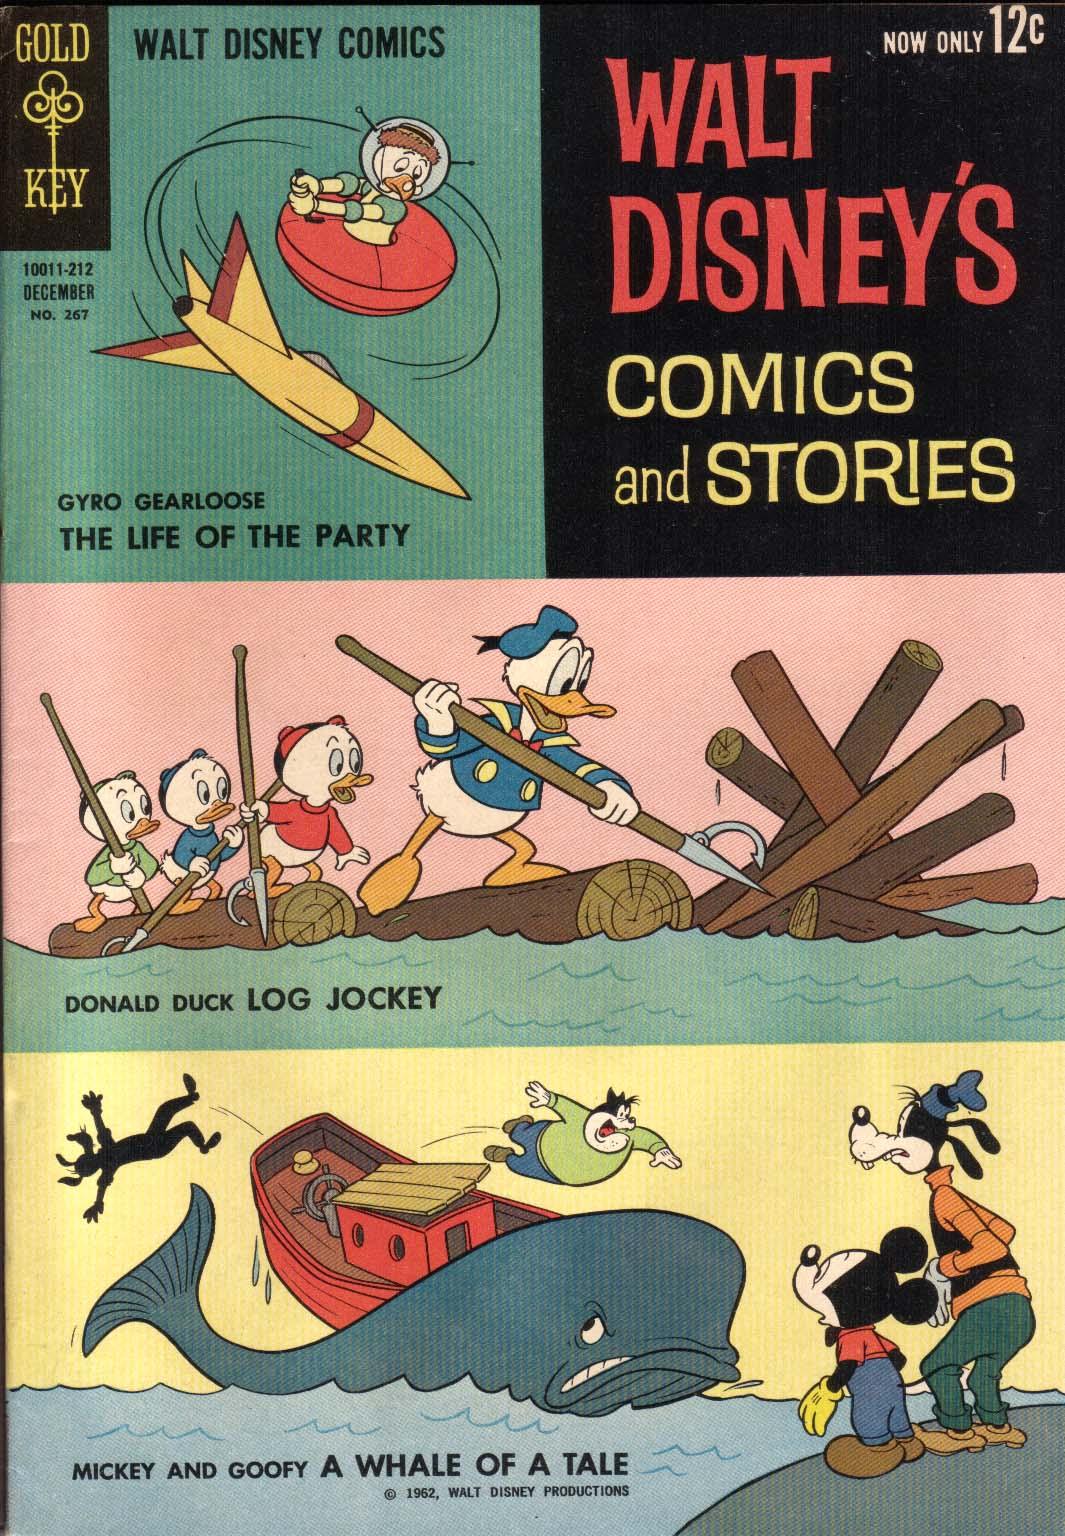 Walt Disneys Comics and Stories 267 Page 1